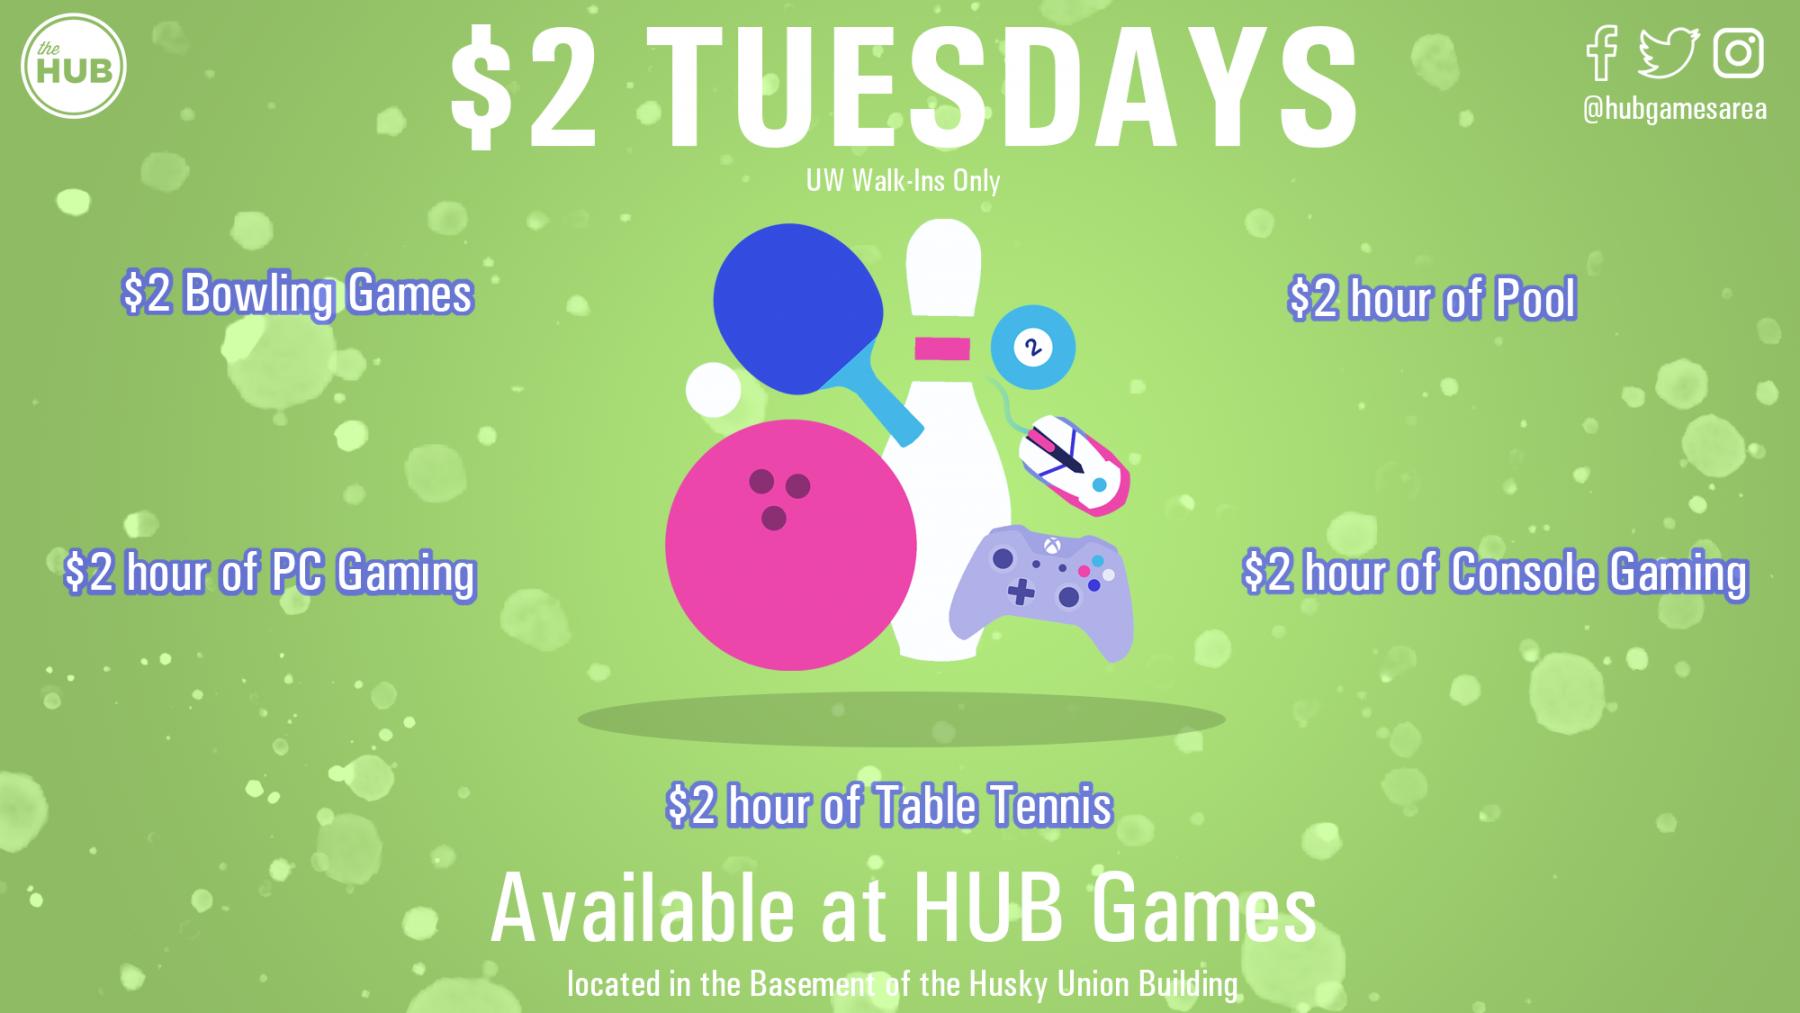 $2 Tuesday Digital Display